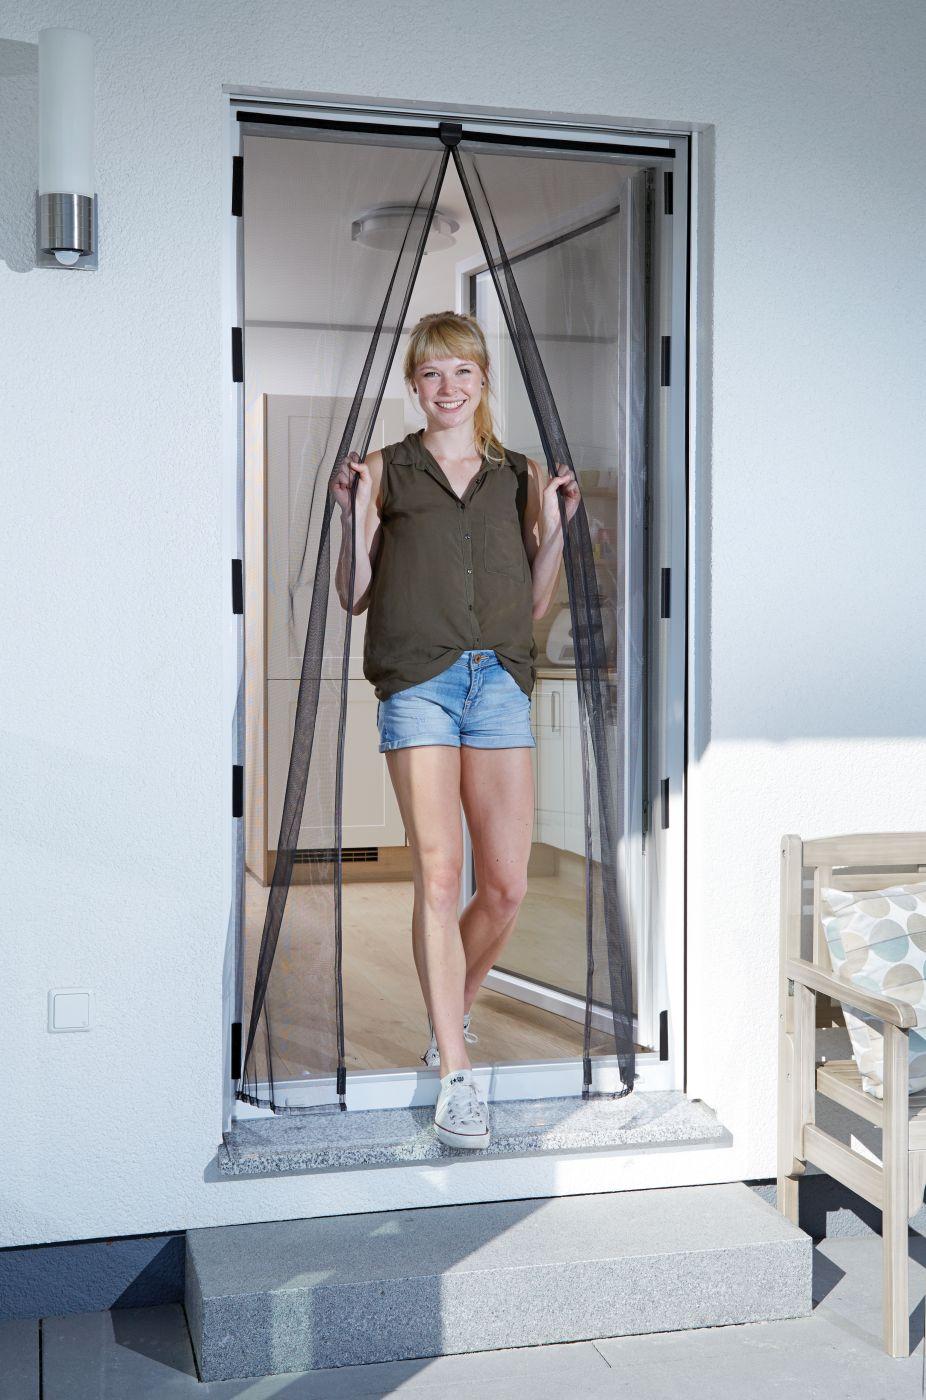 schellenberg insektenschutz magnetvorhang fliegengitter mit magnet f r t ren 120 x 240 cm in. Black Bedroom Furniture Sets. Home Design Ideas